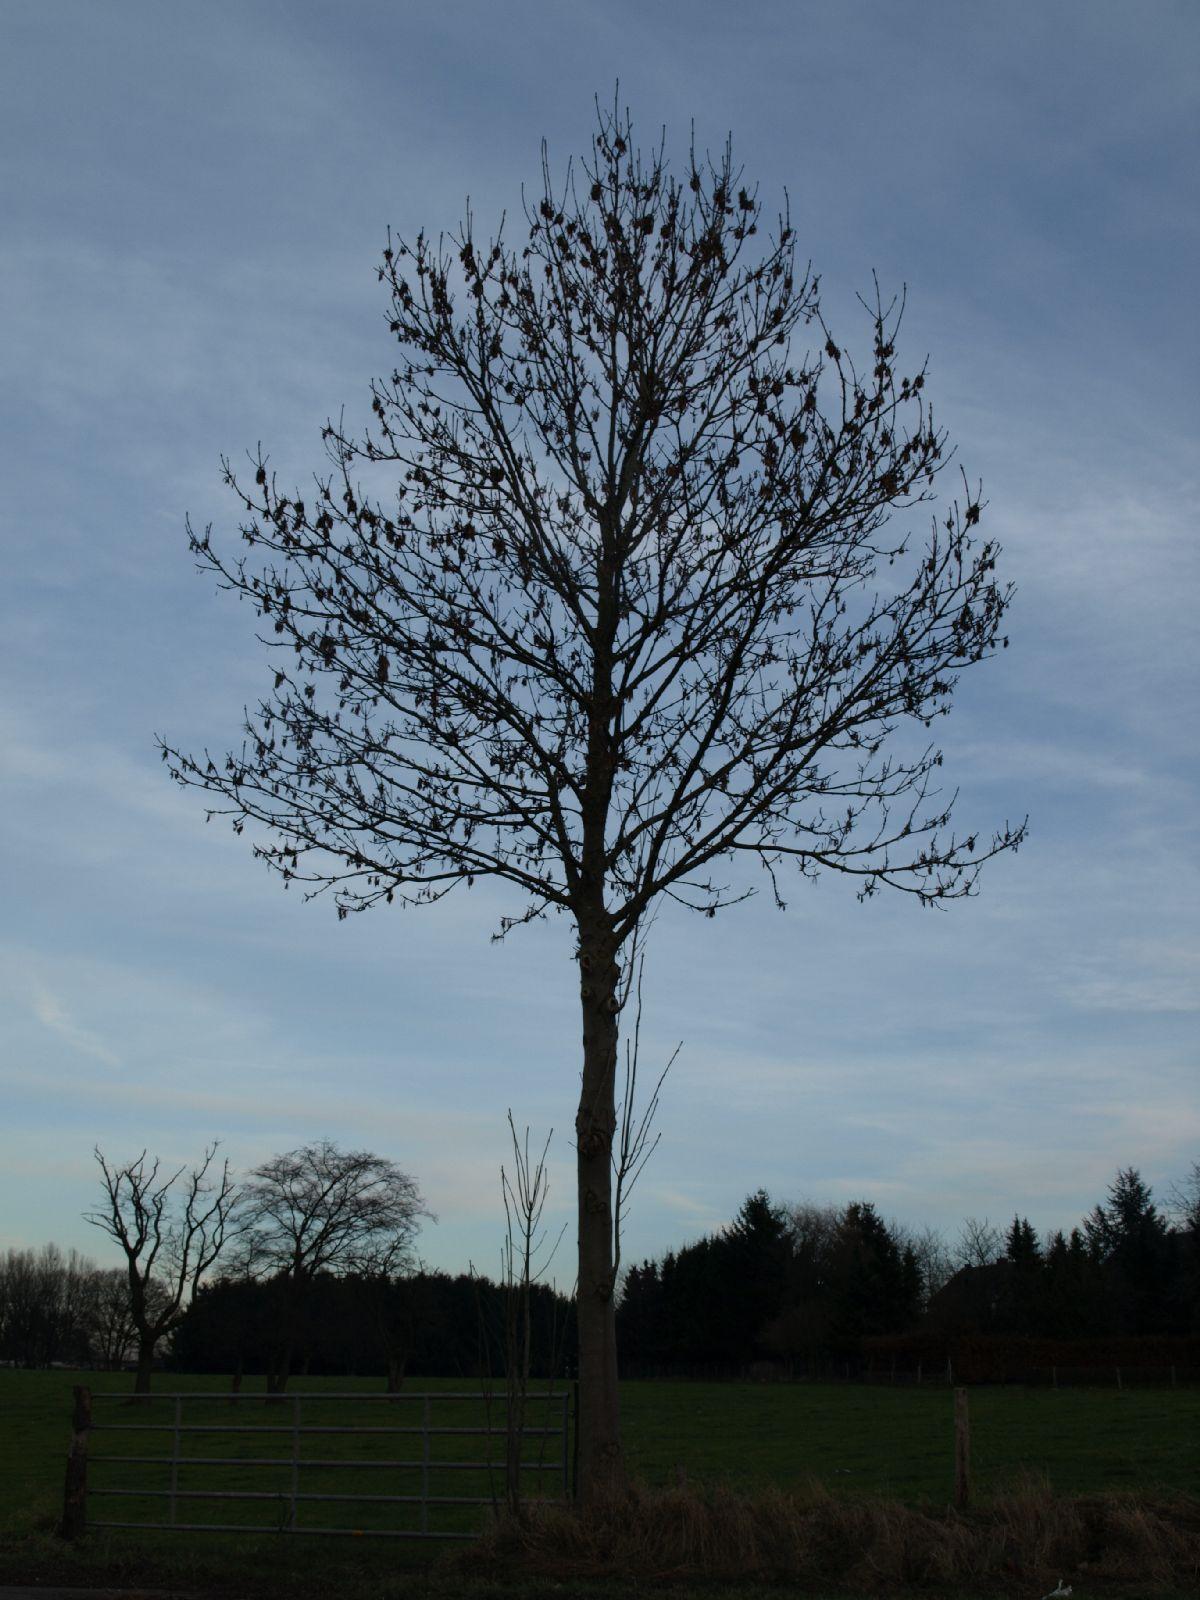 Pflanzen-Baum-Silhouette-Foto_Textur_B_PC147680